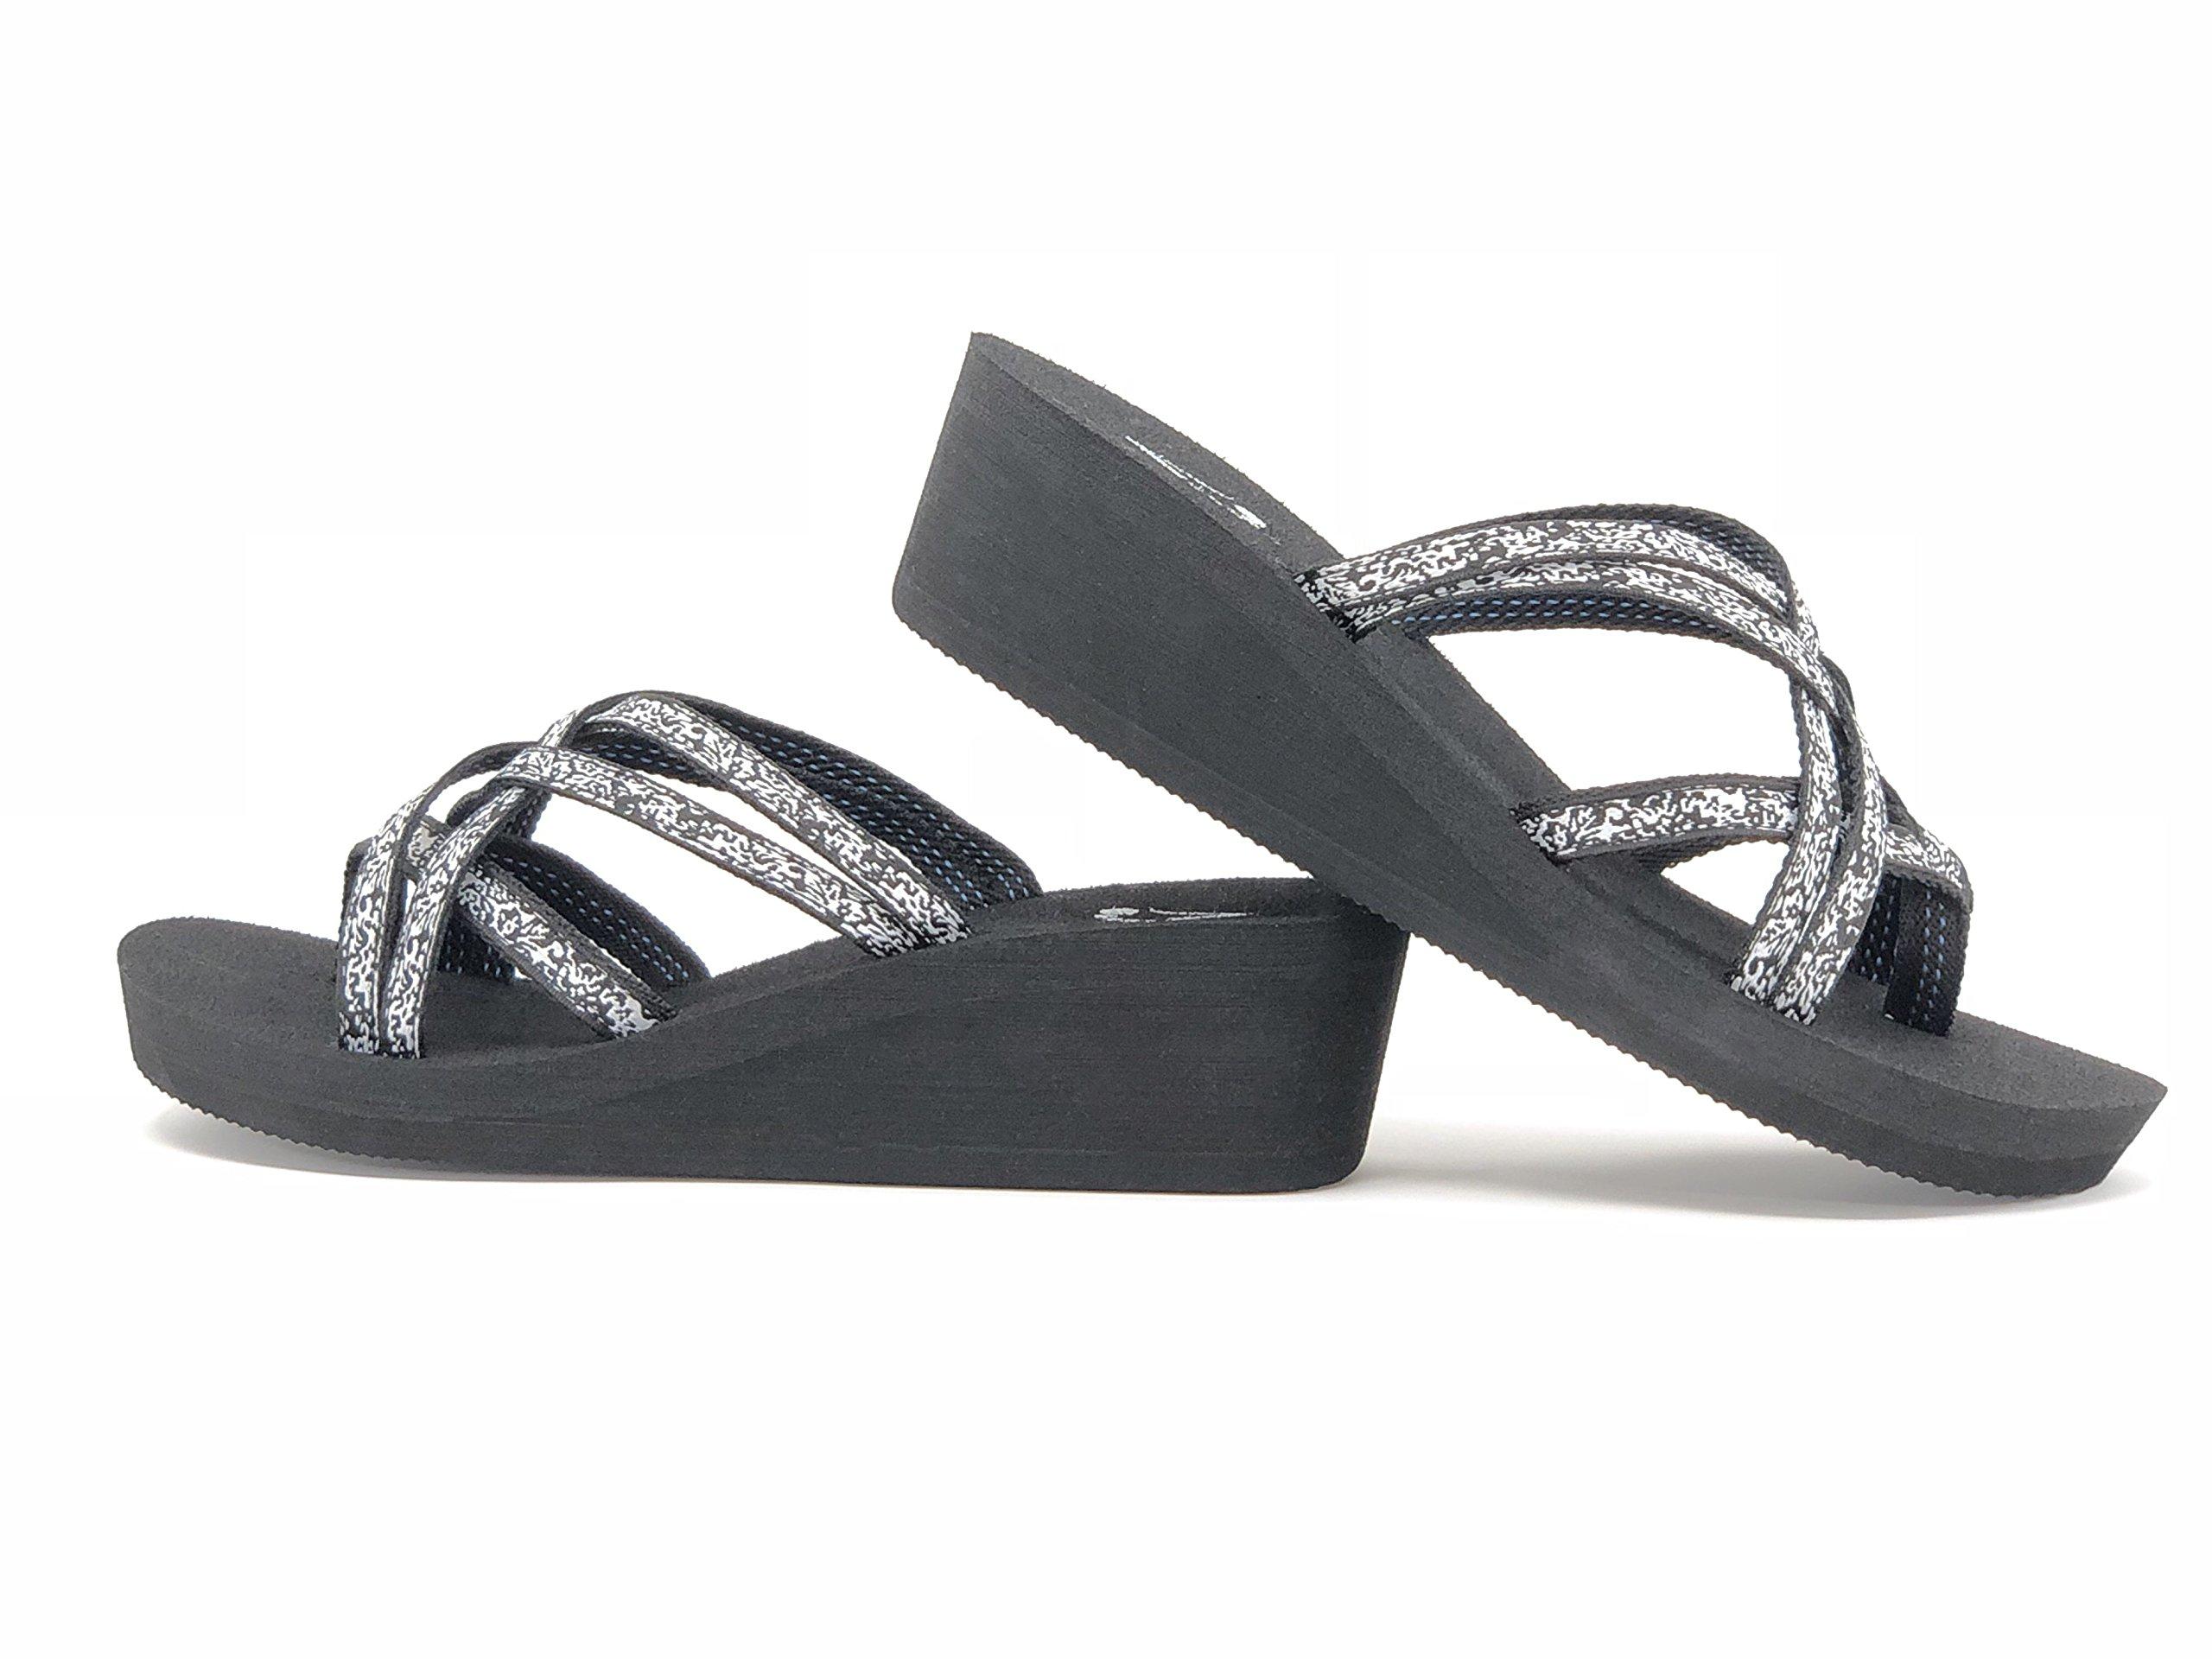 Viakix Wedge Flip Flops for Women – Comfortable, Stylish, Cute, Women's Strappy Sandal for Walking, Beach, Travel by Viakix (Image #7)